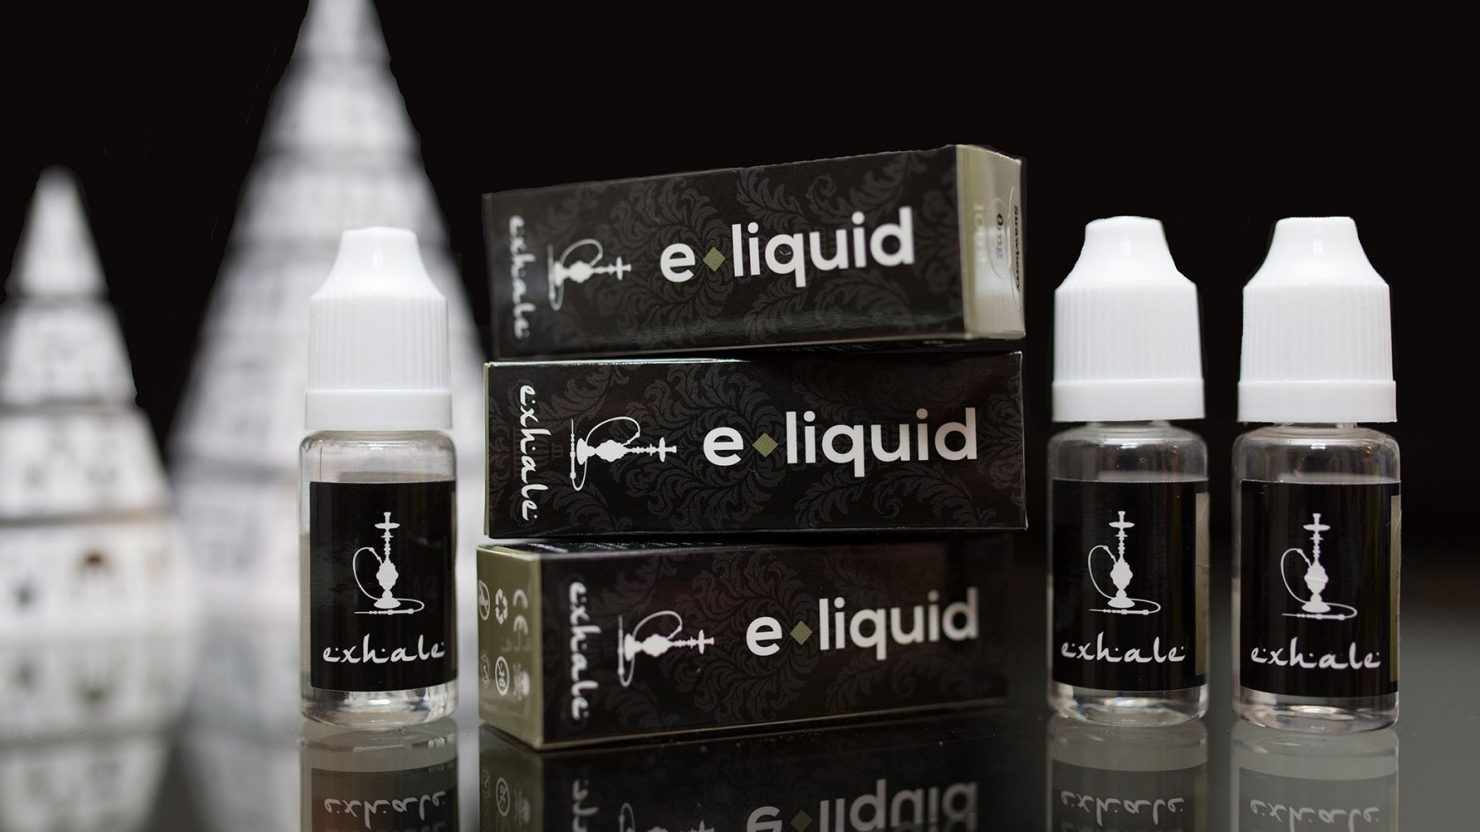 packaging design and branding for exhale shisha vape liquid